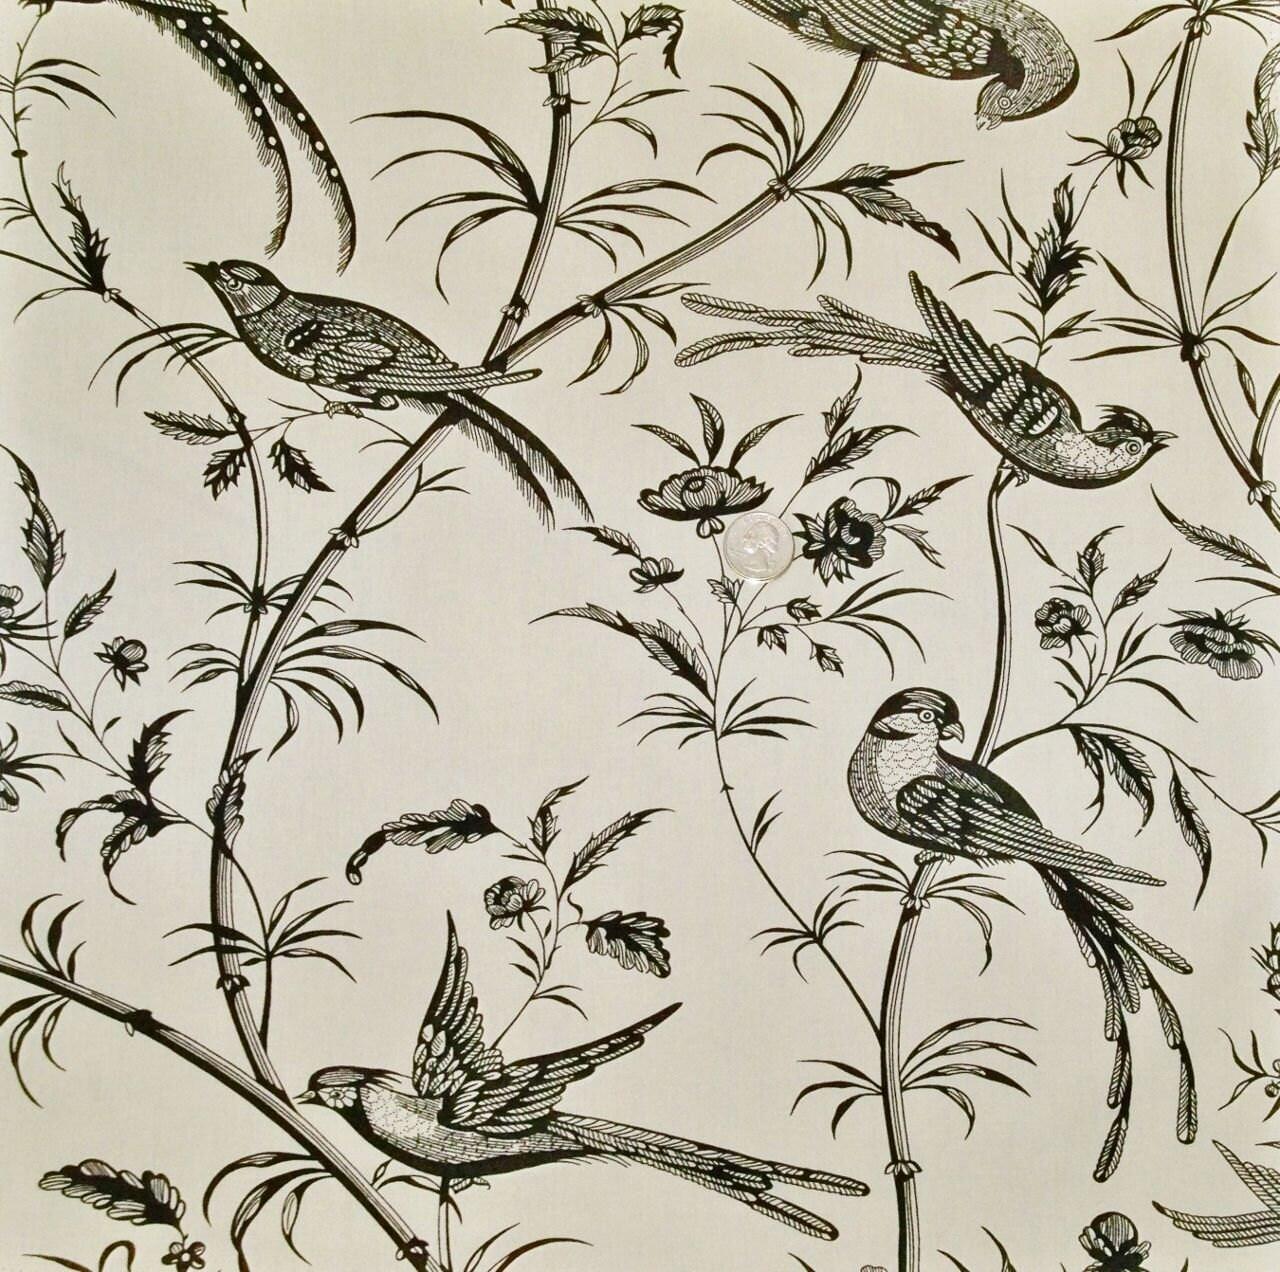 brunschwig u0026 fils bengali birds toile fabric 10 yards cream black